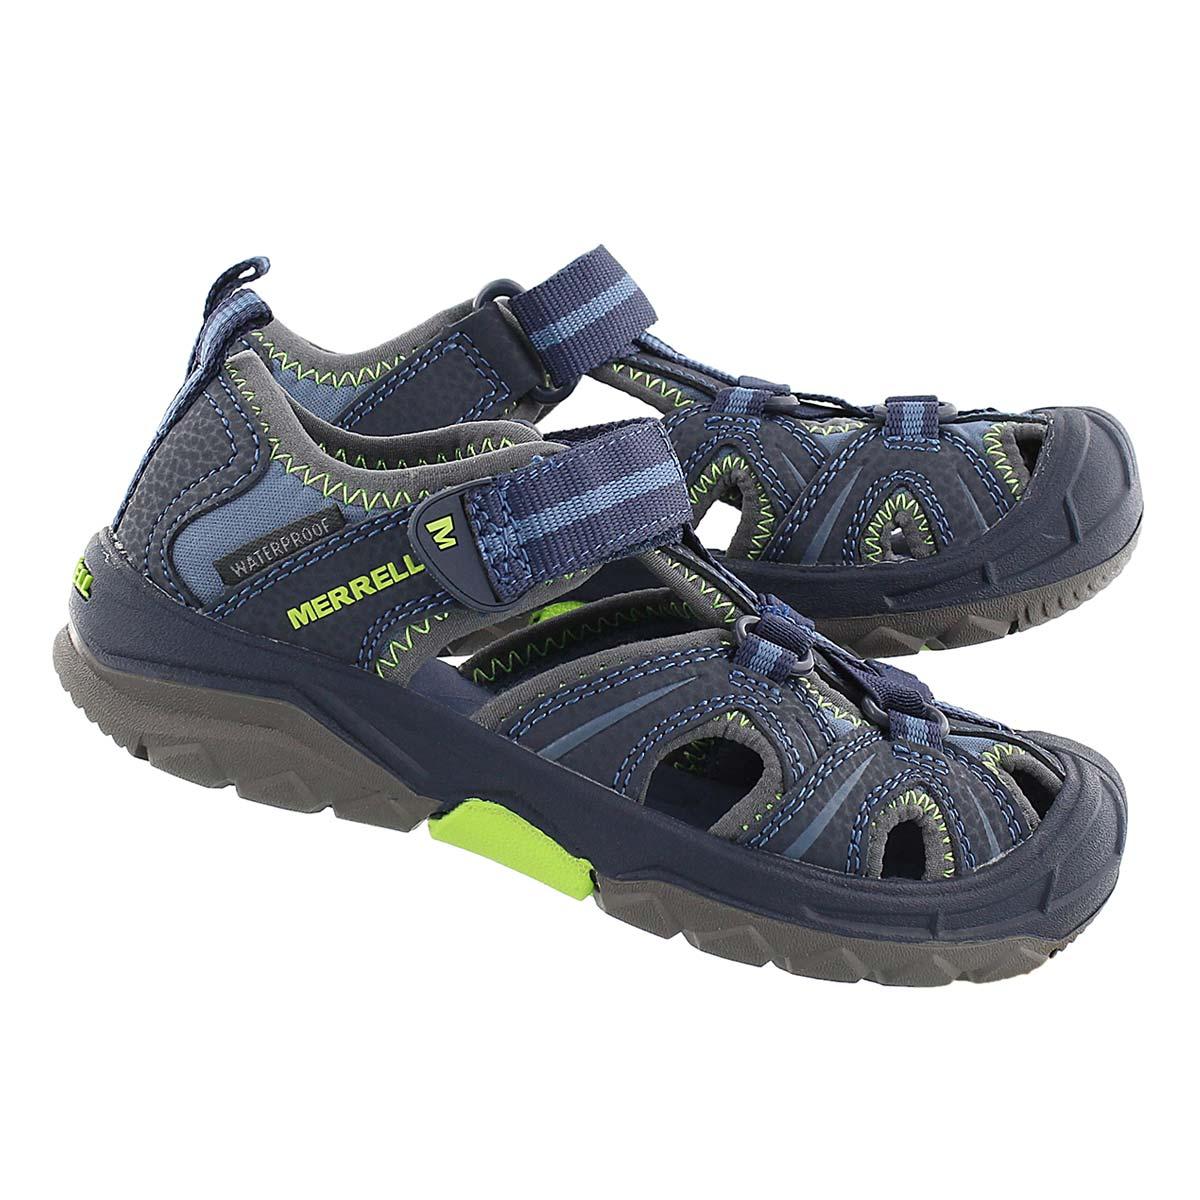 Bys Hydro nvy/green fisherman sandal